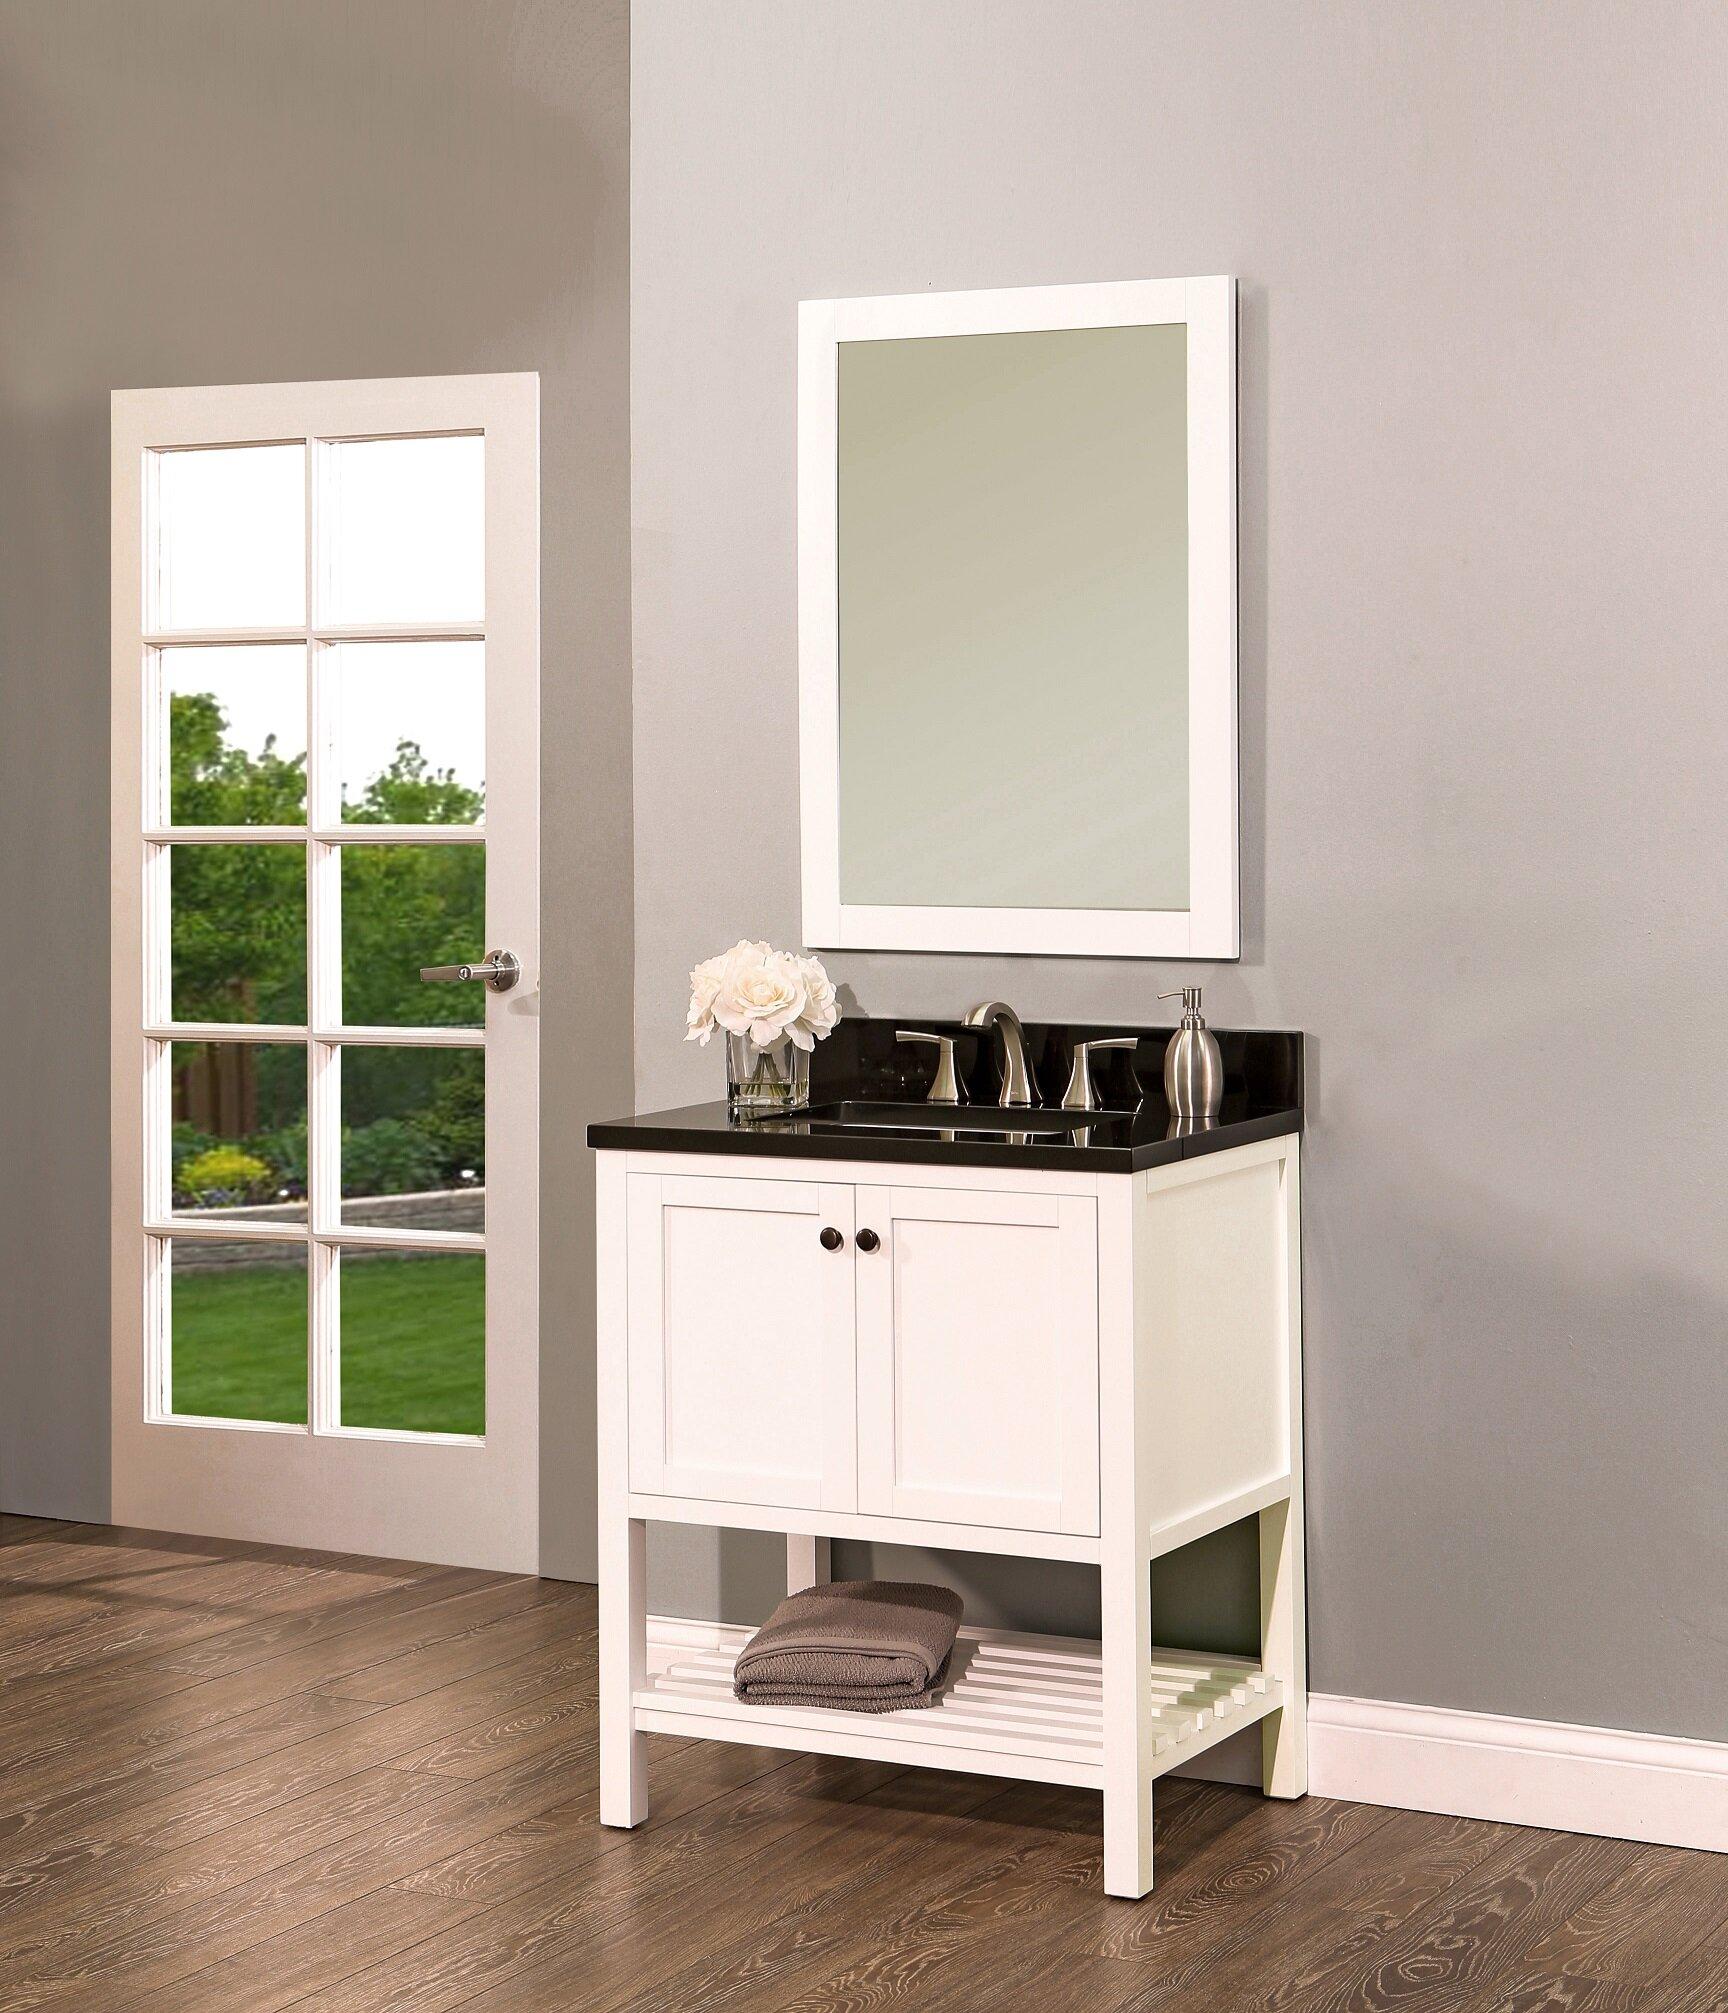 Ngy Stone Cabinet Hampton Bay 30 Single Bathroom Vanity With Mirror Wayfair